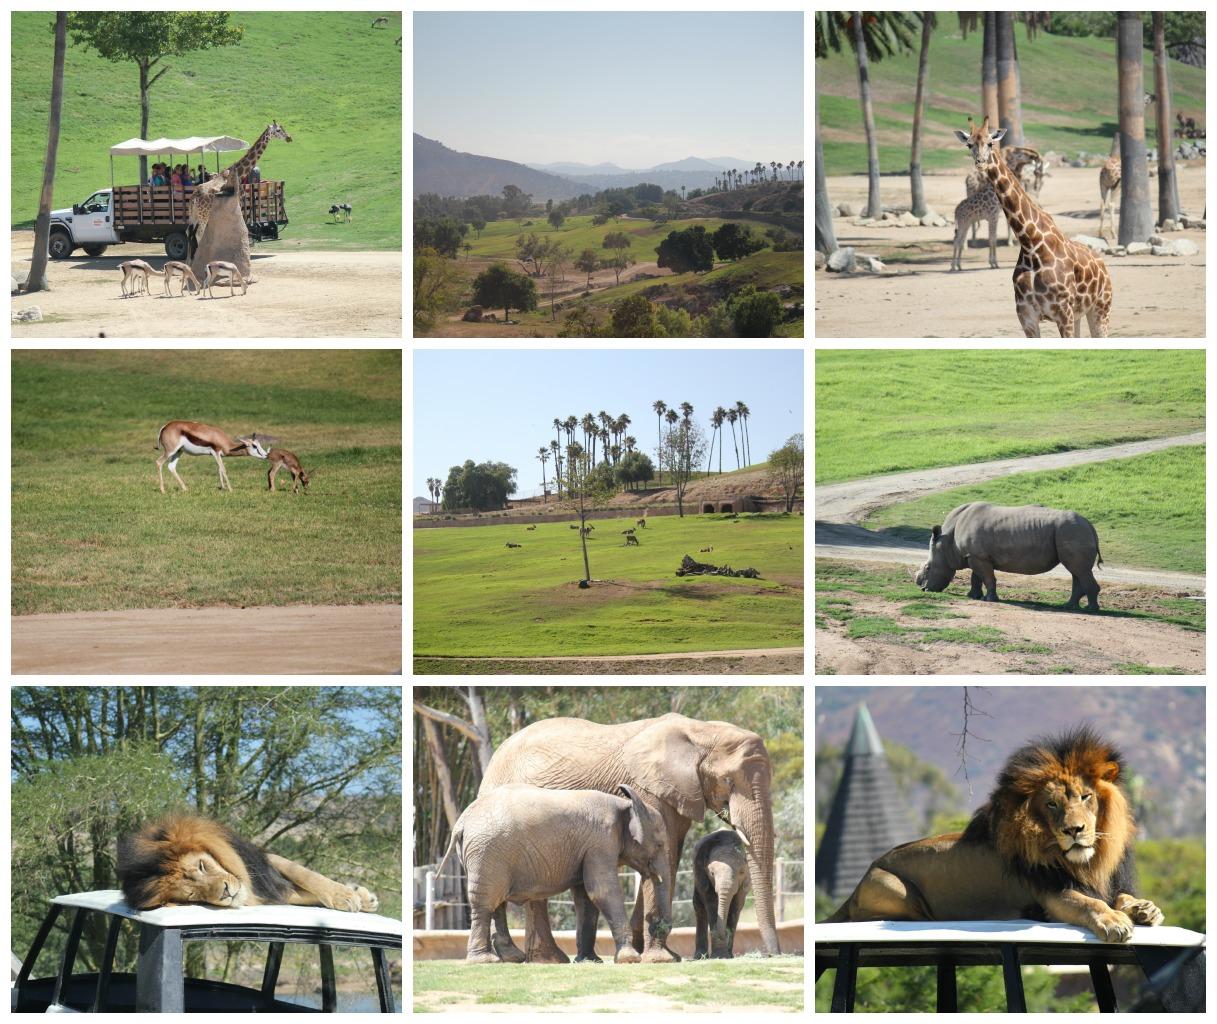 Zoo Animal Park